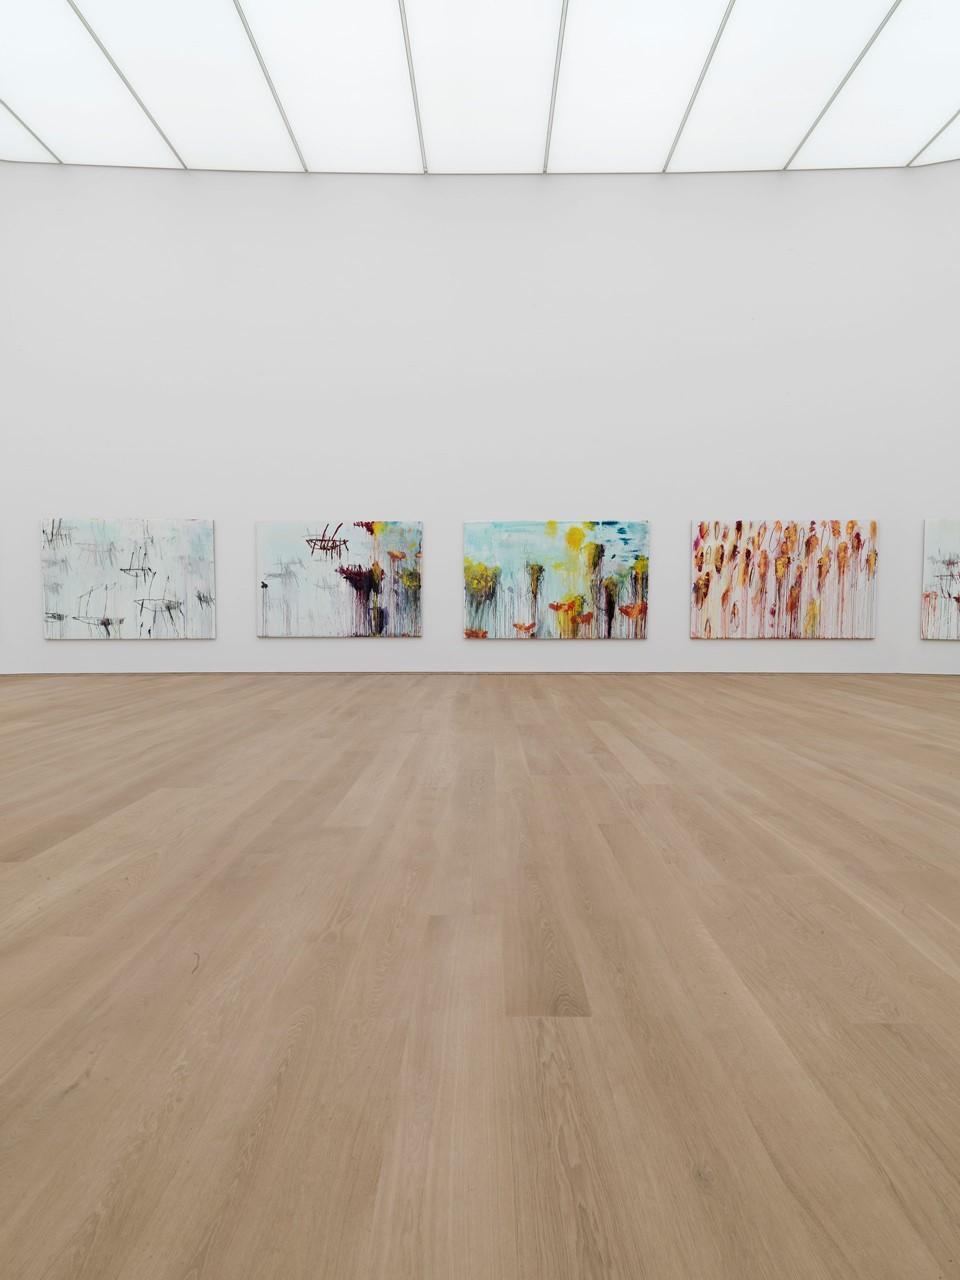 oak-flooring_lye-white-oil_museum-brandhorst_gallery-wall_dinesen.jpg